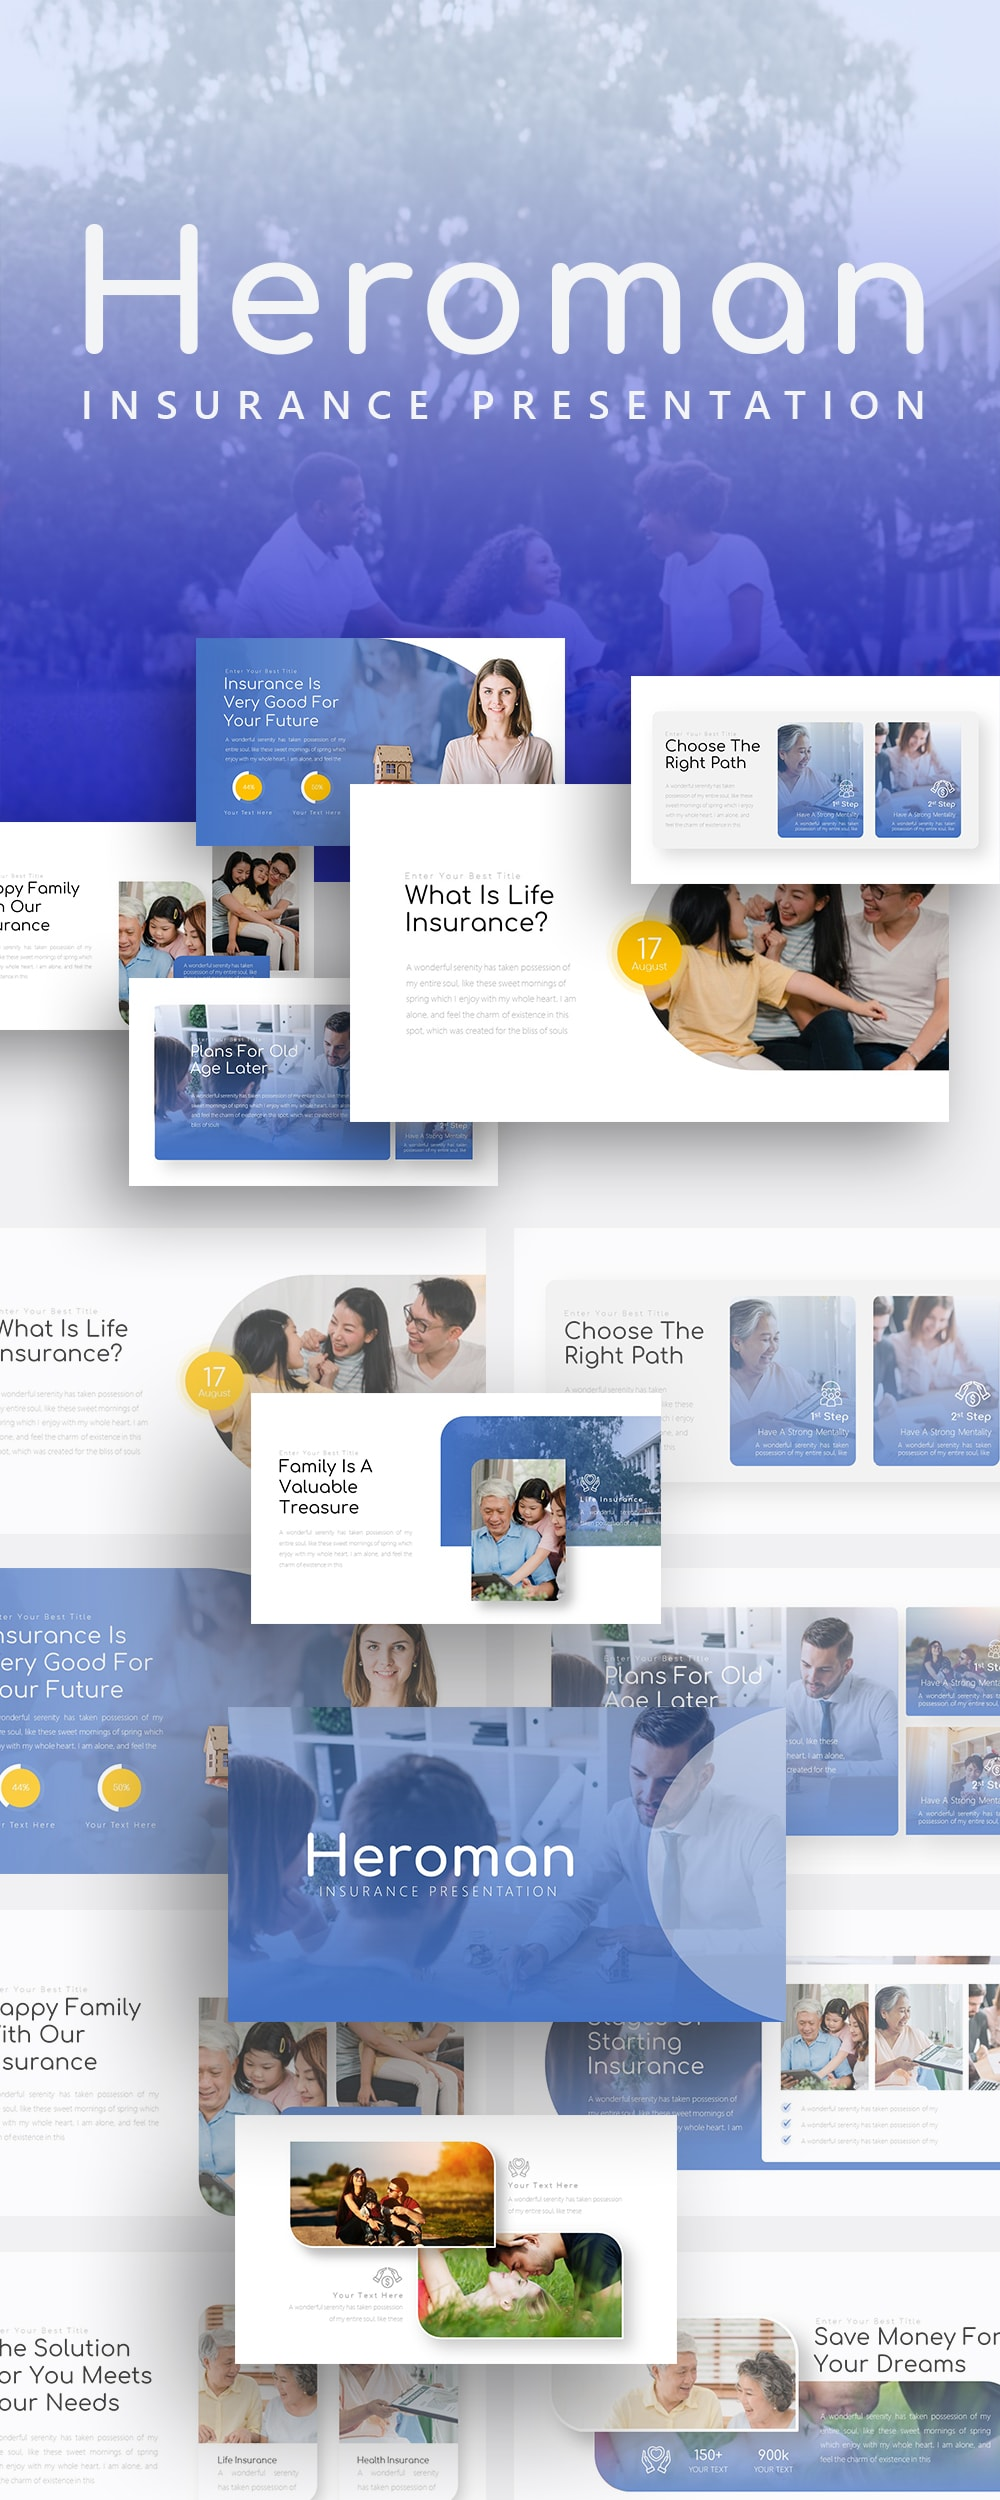 Free Heroman Insurance PowerPoint Template